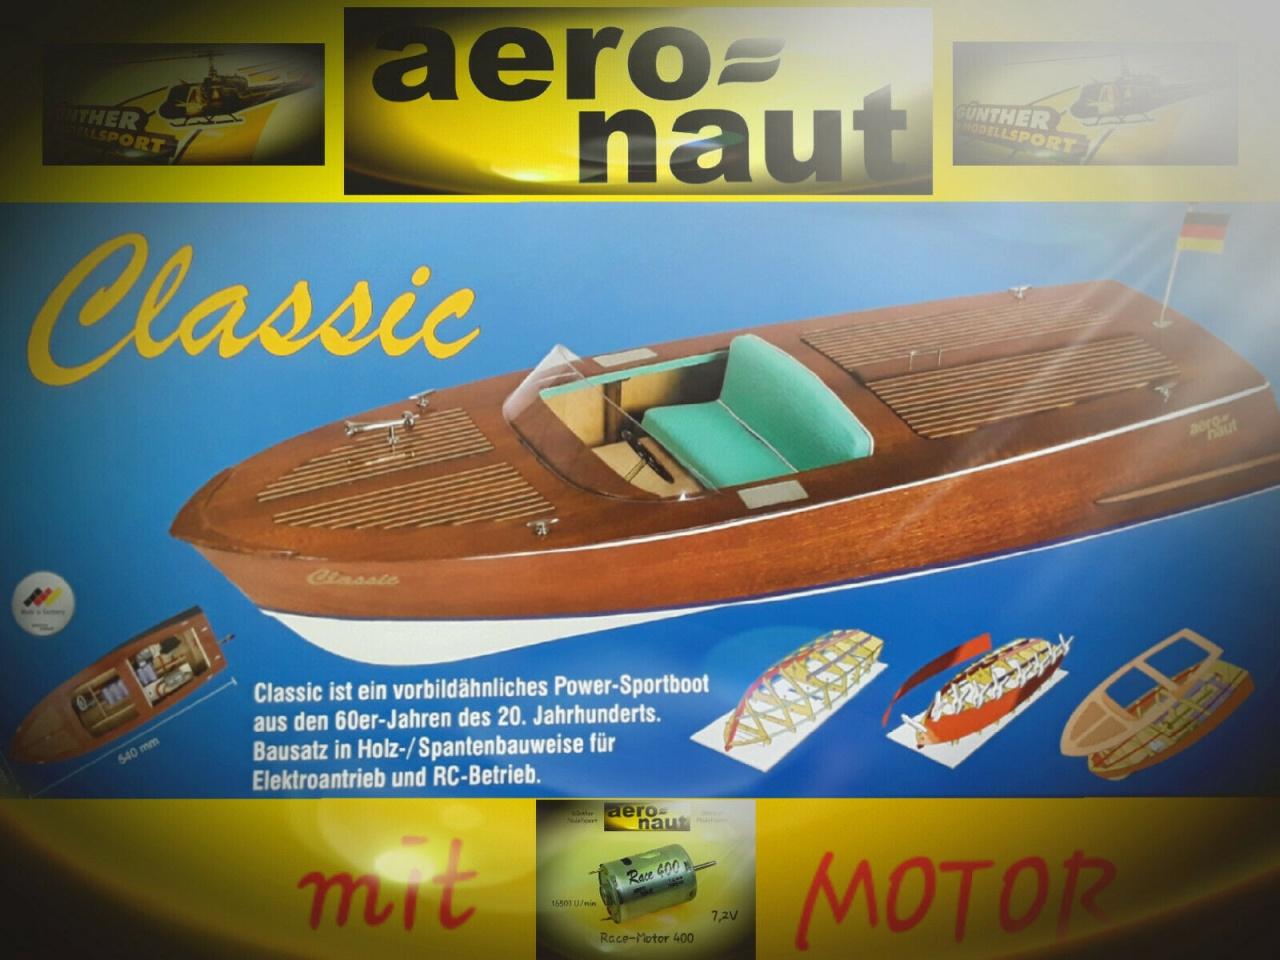 Classic Sportboot, 3092/00.M v. aeronaut